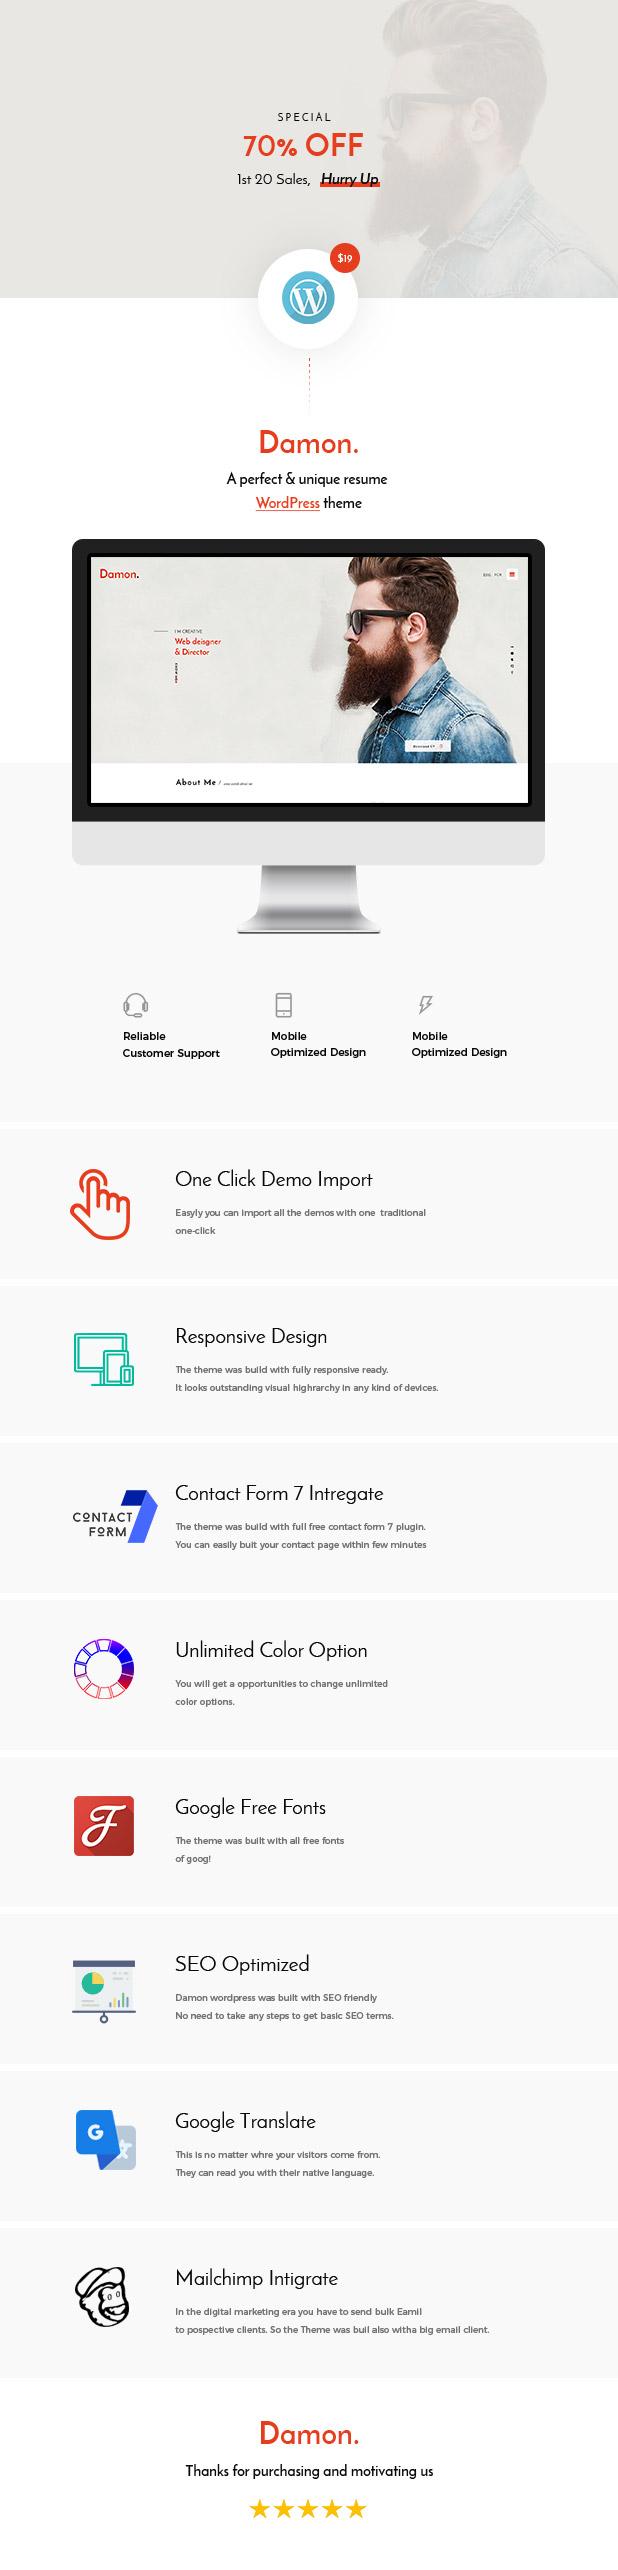 Download] Damon - Resume, Personal, CV, vCard WordPress Theme Nulled